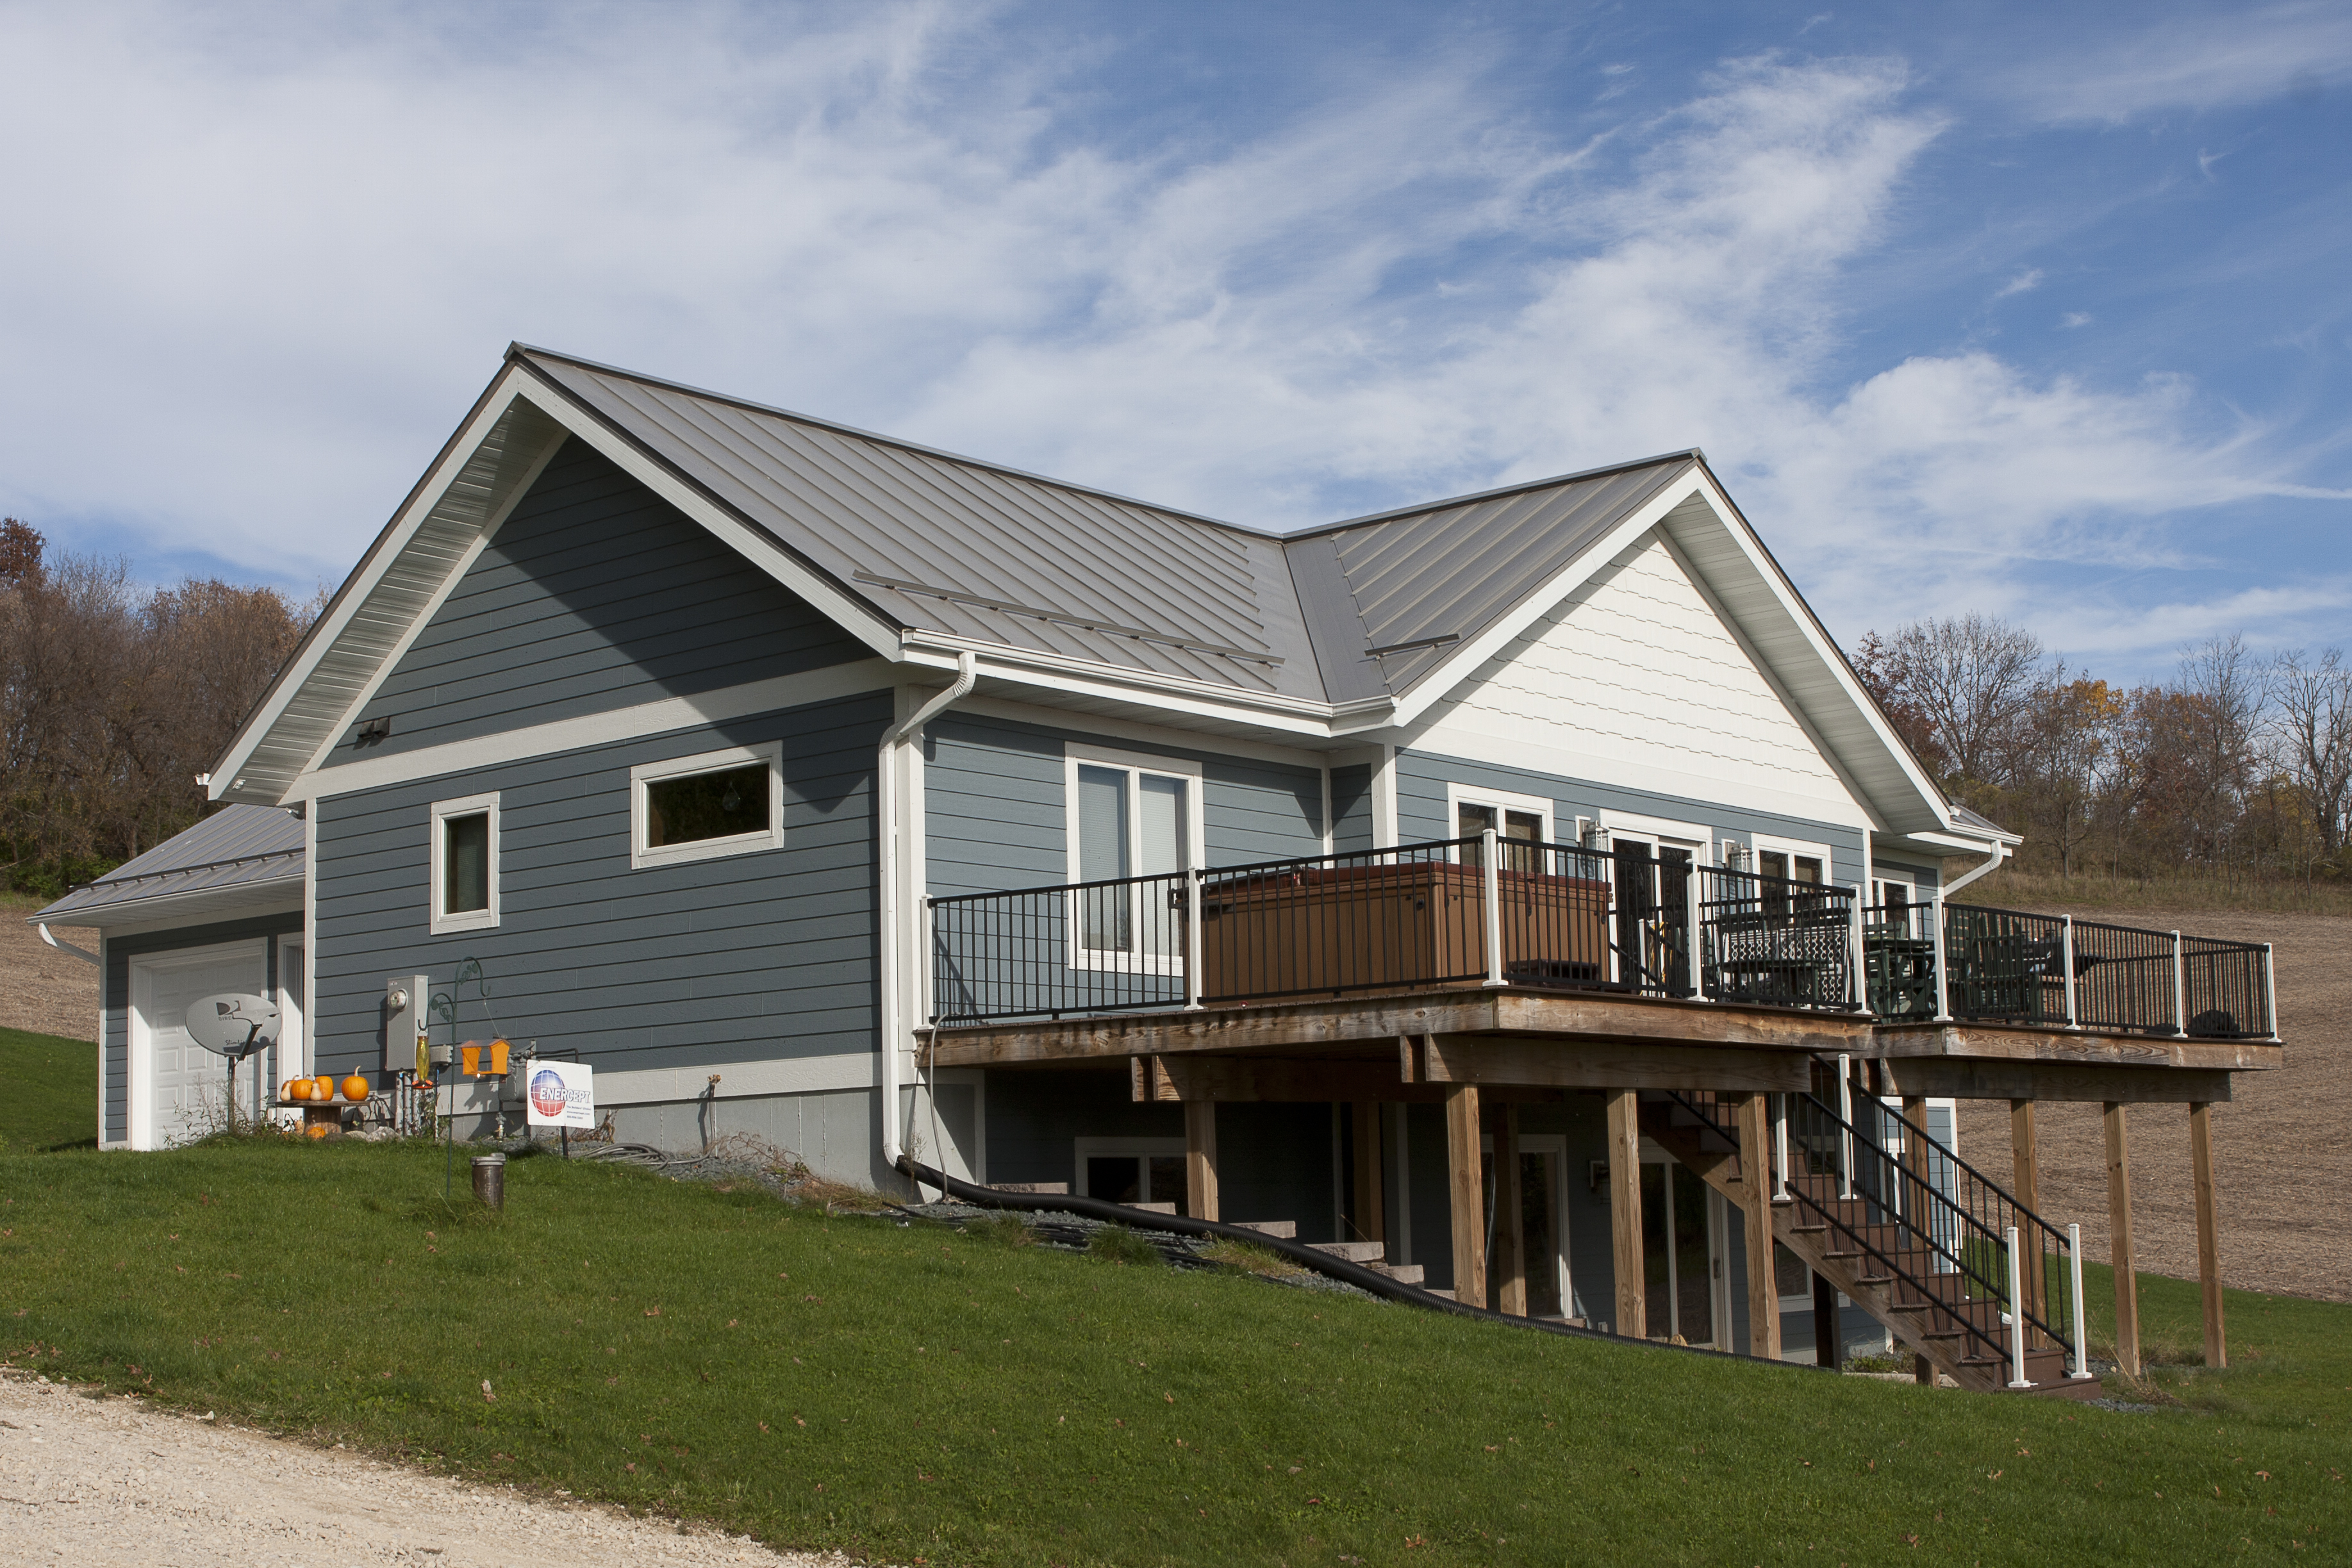 standing seam sheet metal roofing light slate grey snow rail house residential wisconsin minnesota iowa illinois north dakota